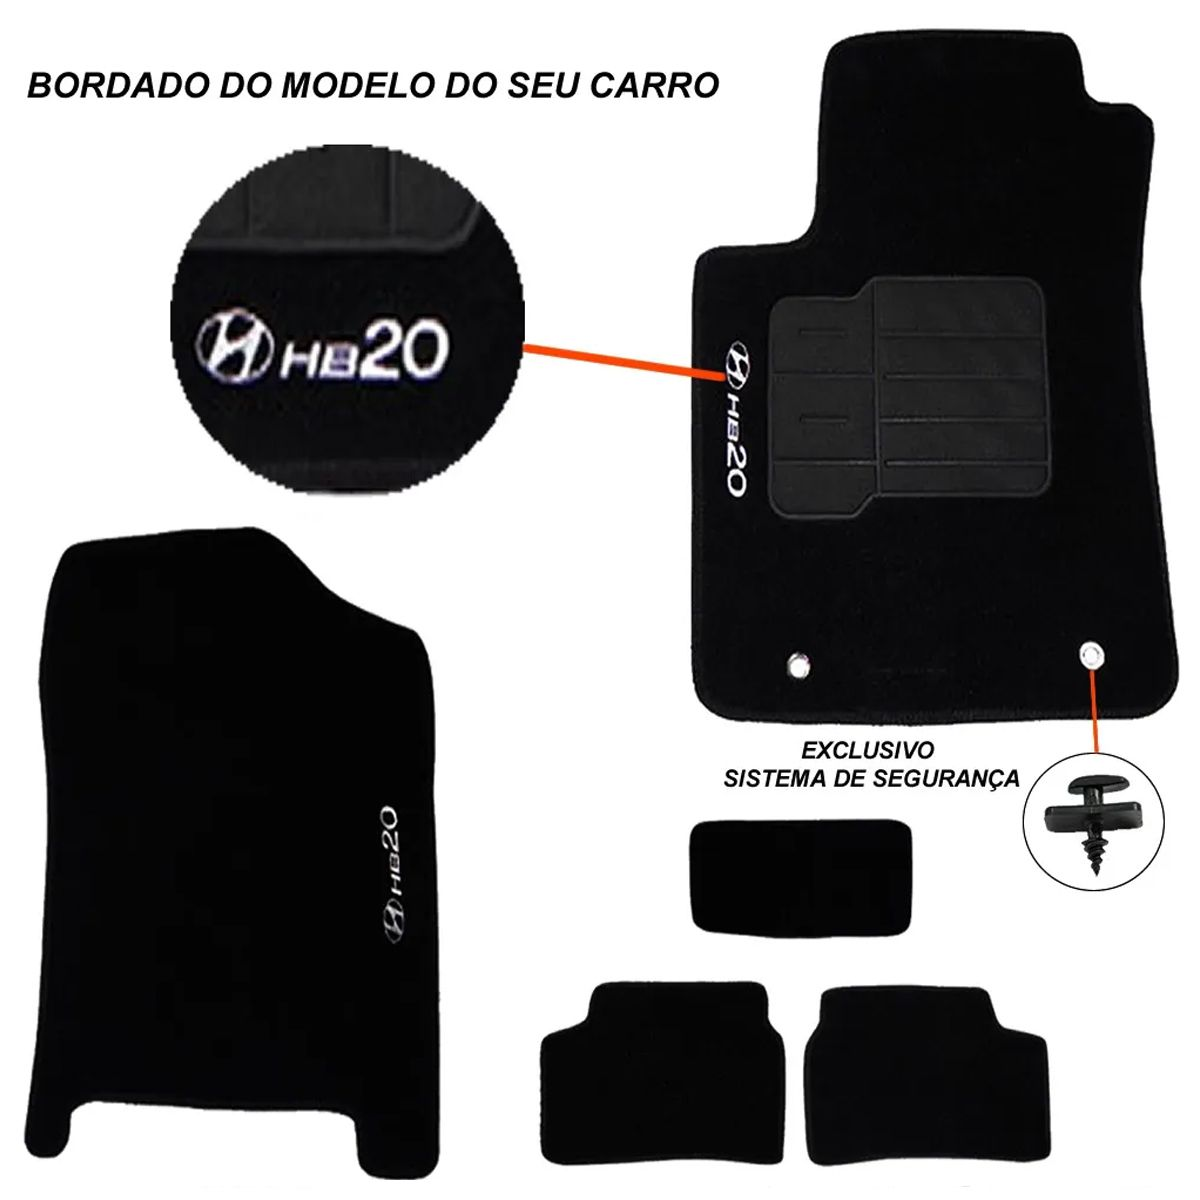 Tapete Carpete Hyundai Hb20 Bordado Logo Preto Personalizado Poliparts